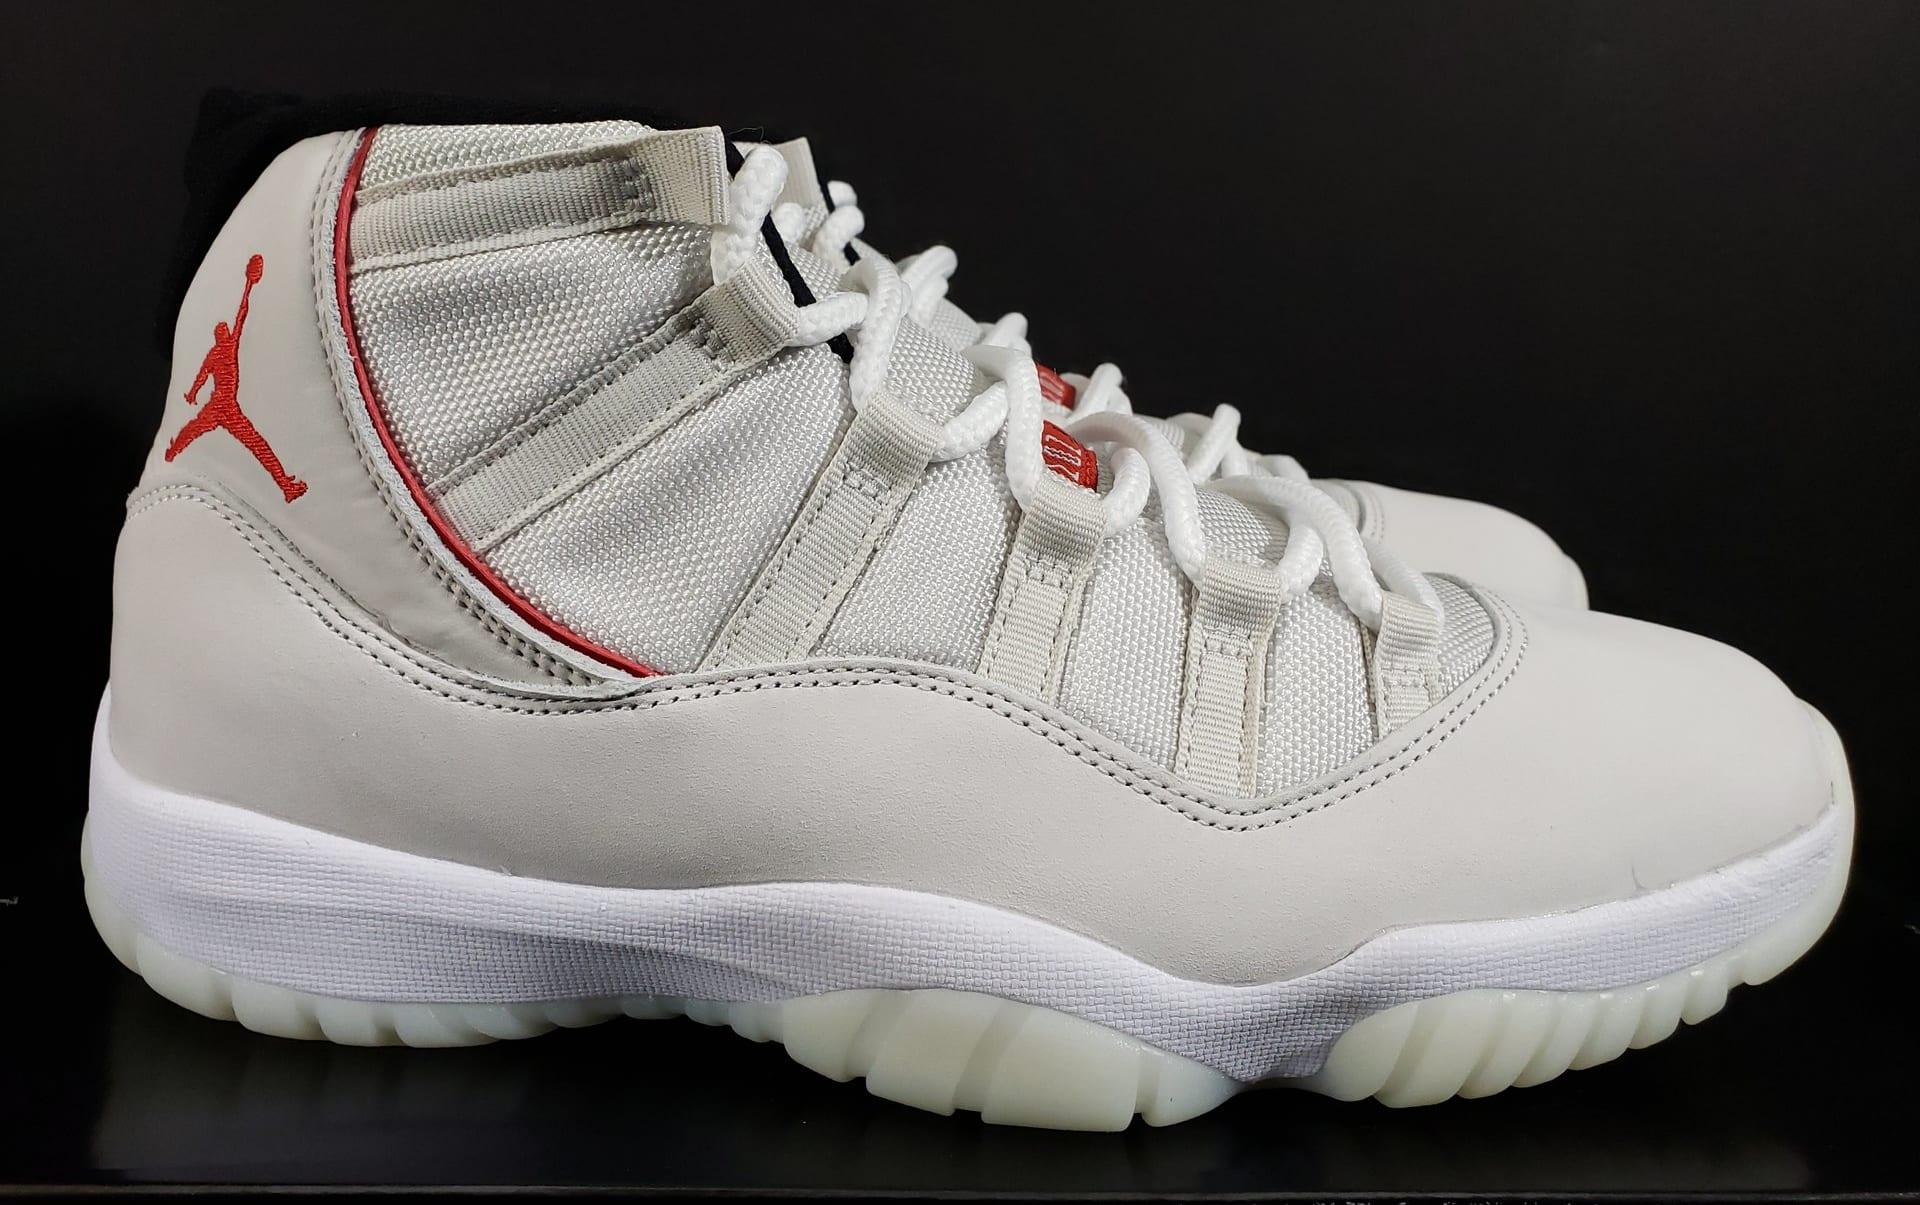 cf1f97510f8 Air Jordan 11 XI Platinum Tint Release Date 378037-016 | Sole Collector